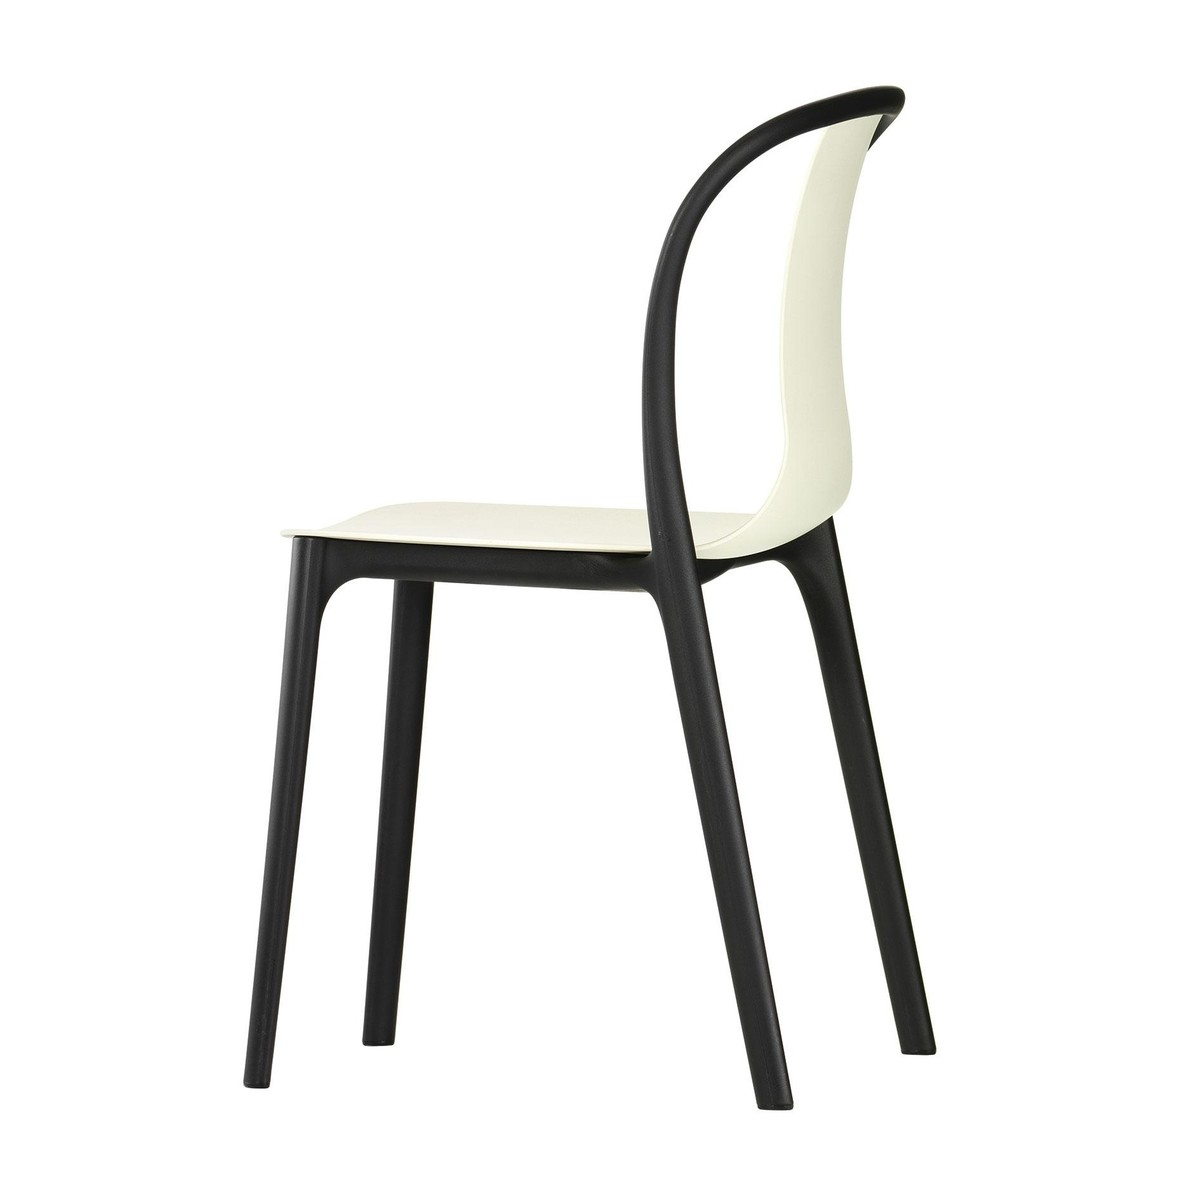 belleville chair plastic chaise de jardin vitra. Black Bedroom Furniture Sets. Home Design Ideas